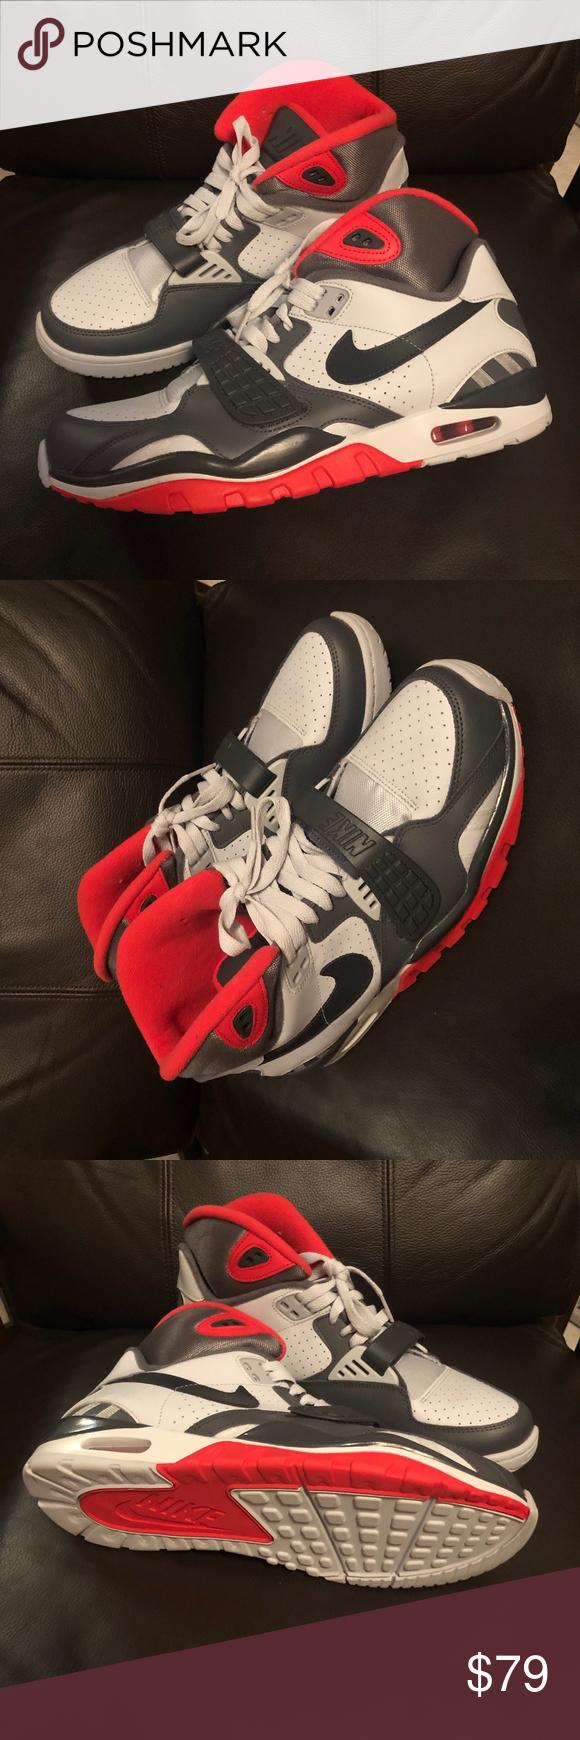 voltereta oportunidad burlarse de  Nike Air Trainer SC II Shoes Bo Jackson   Shoes, Nike air, Nike